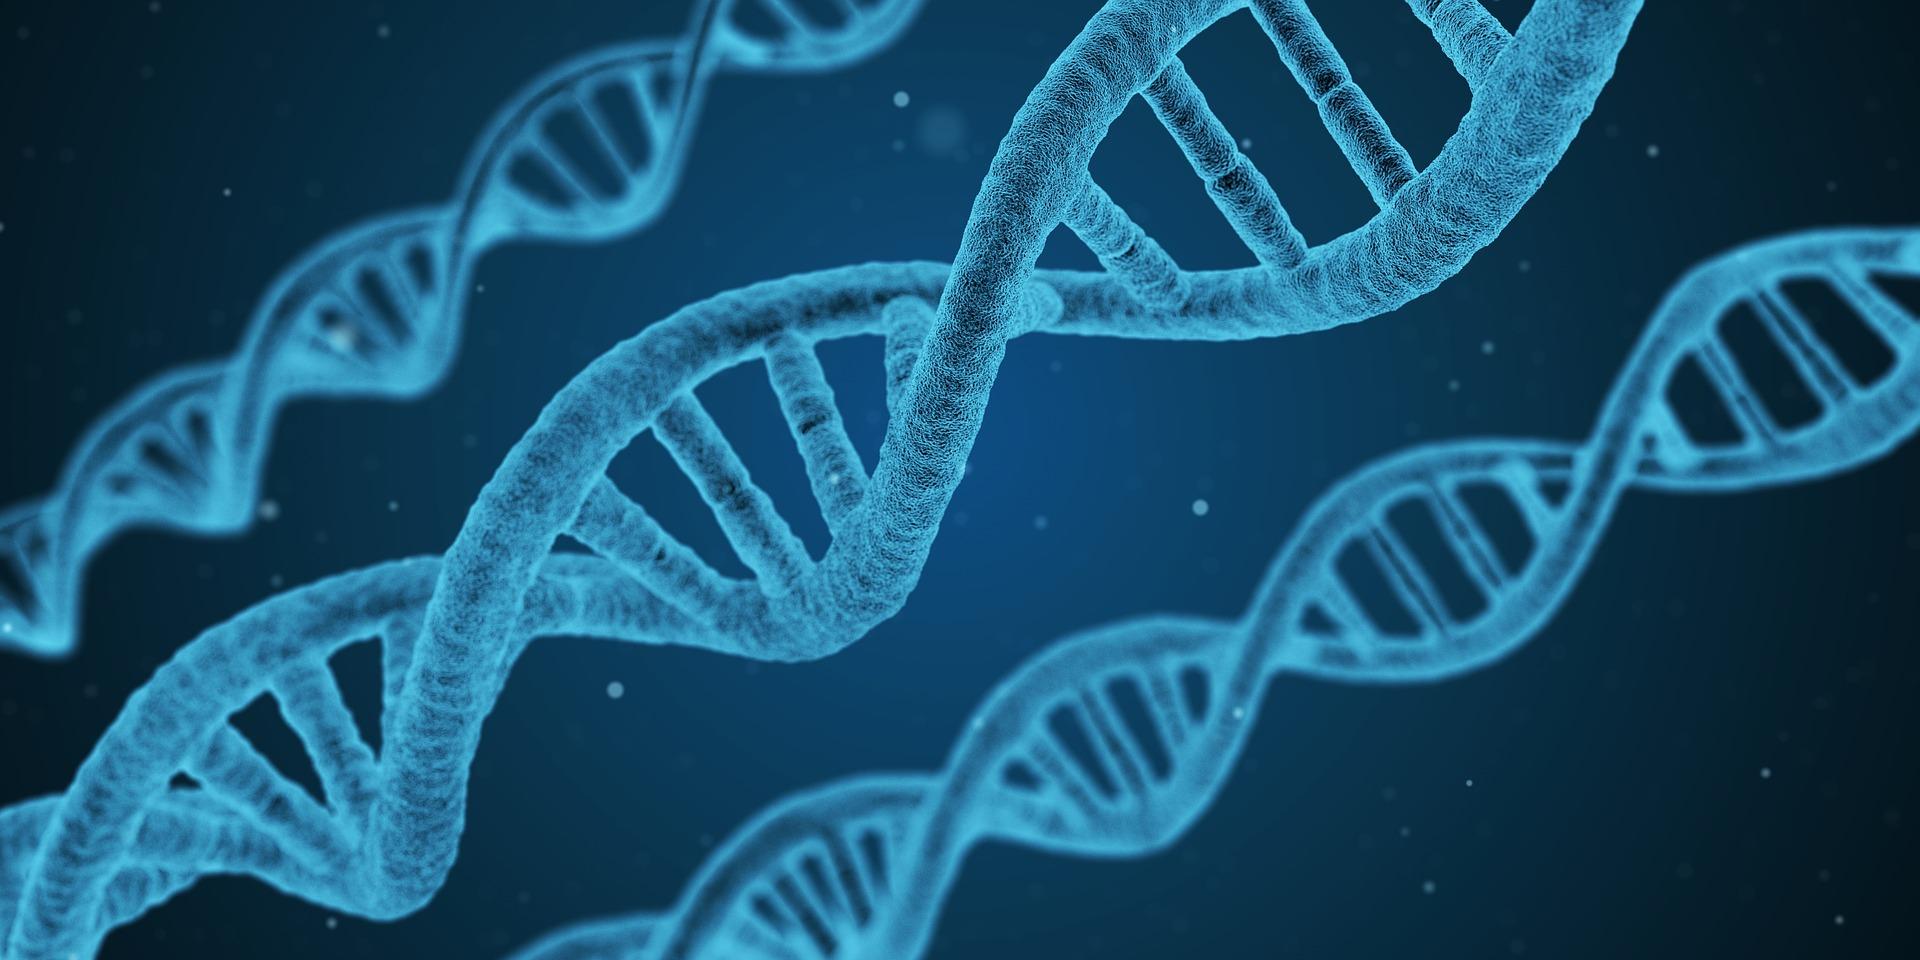 CRISPR/Cas